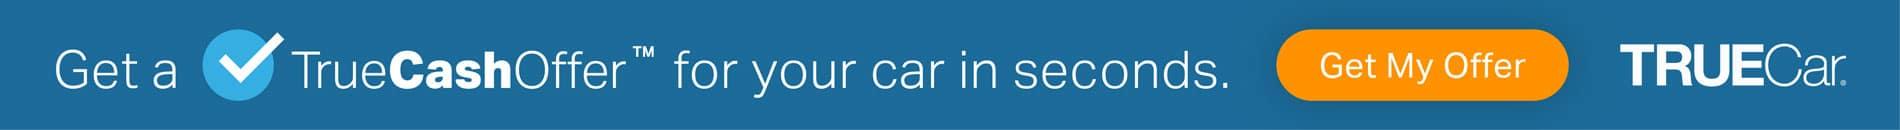 true car img